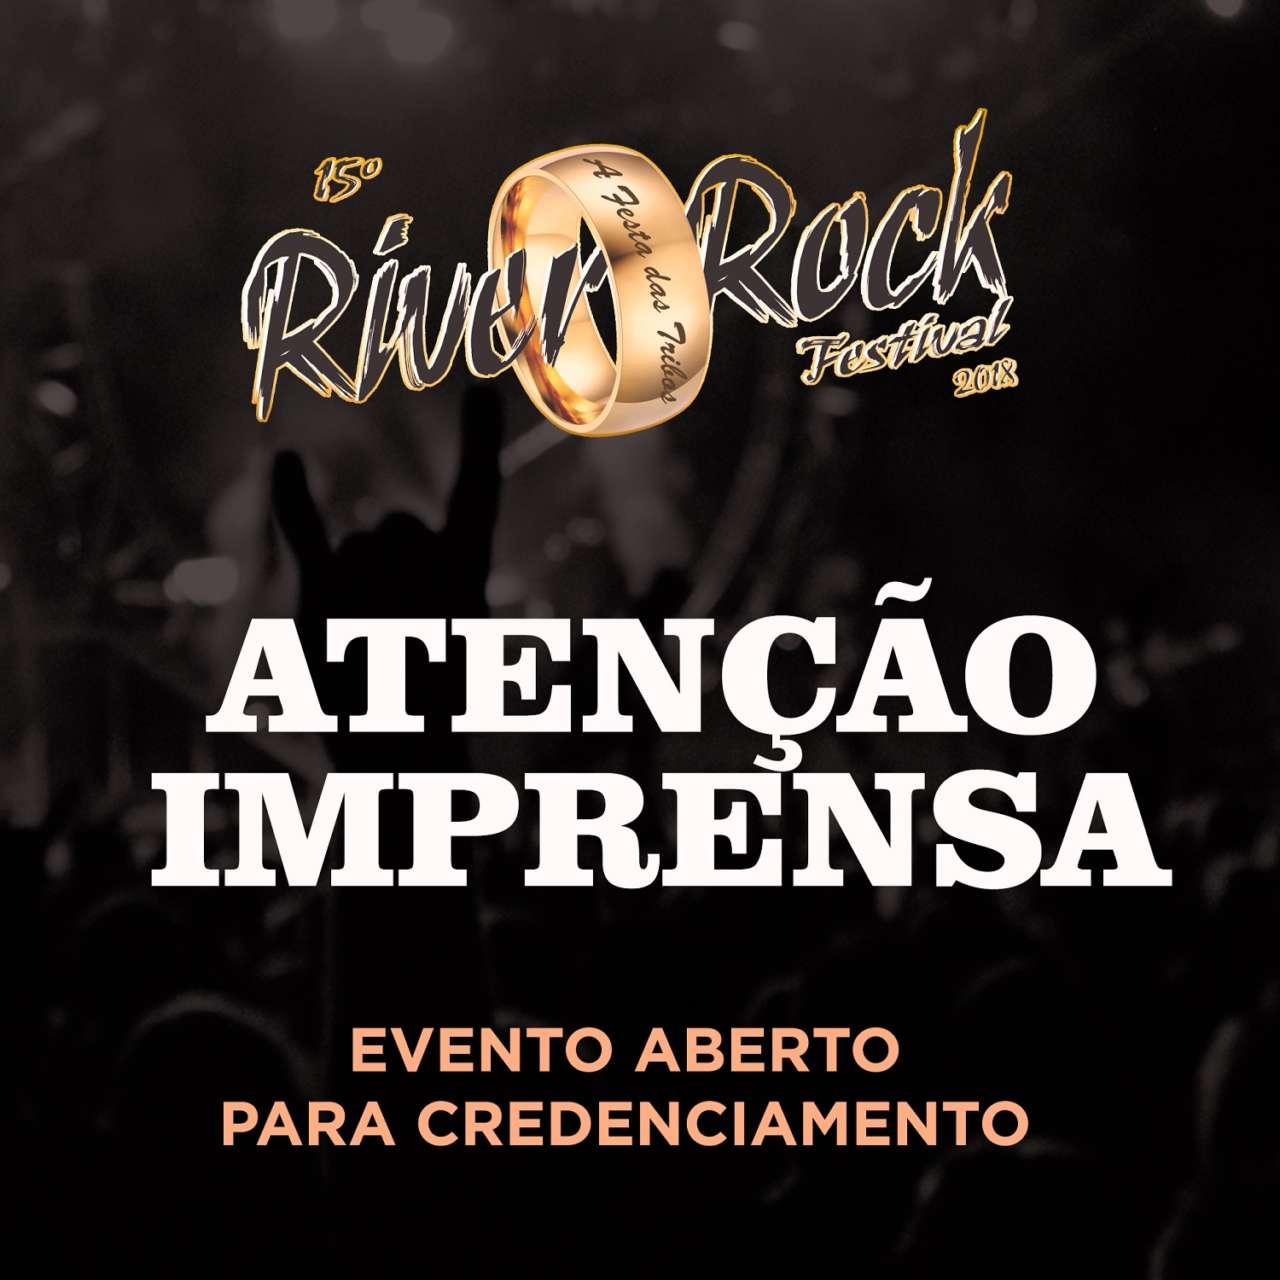 Read more about the article River Rock Festival: Evento abre credenciamento para a imprensa especializada